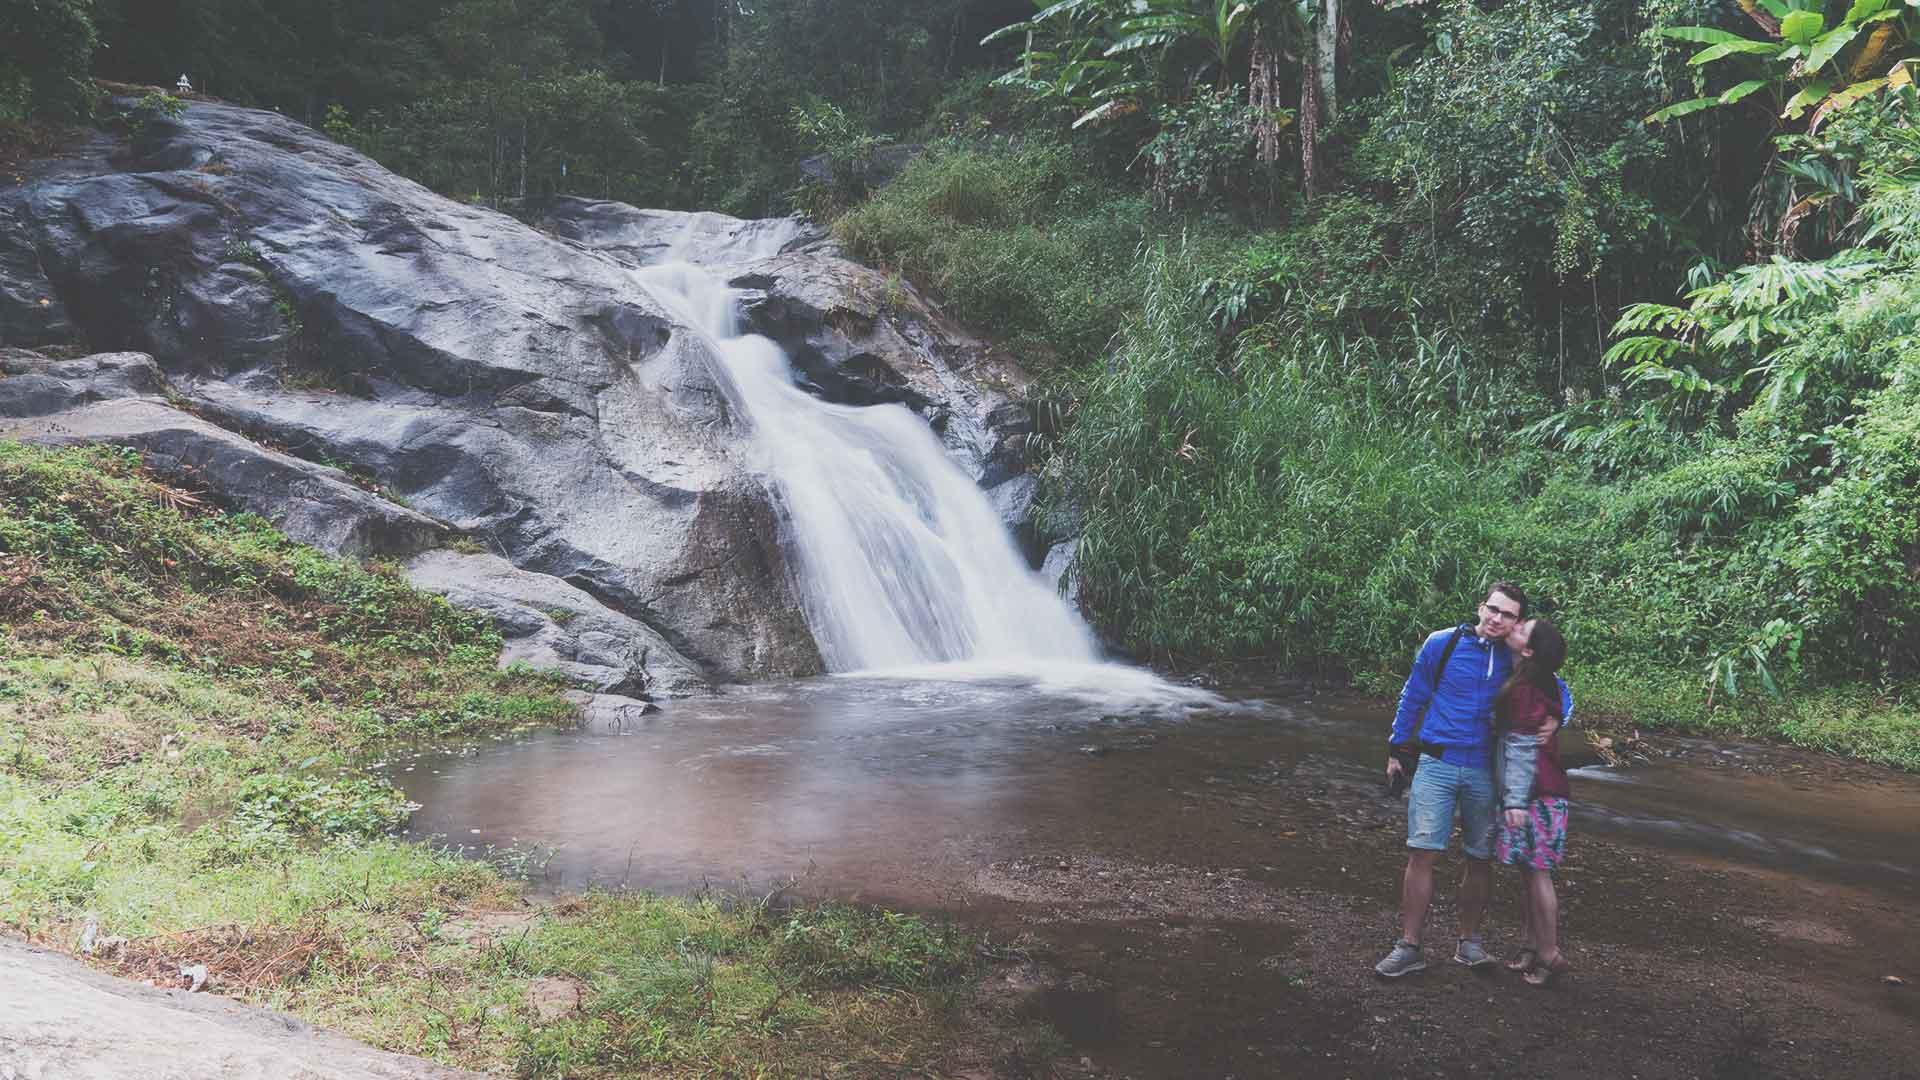 Mor Pang Waterfall - Jasmin und Valentin vor dem Mor Pang Wasserfall in Pai